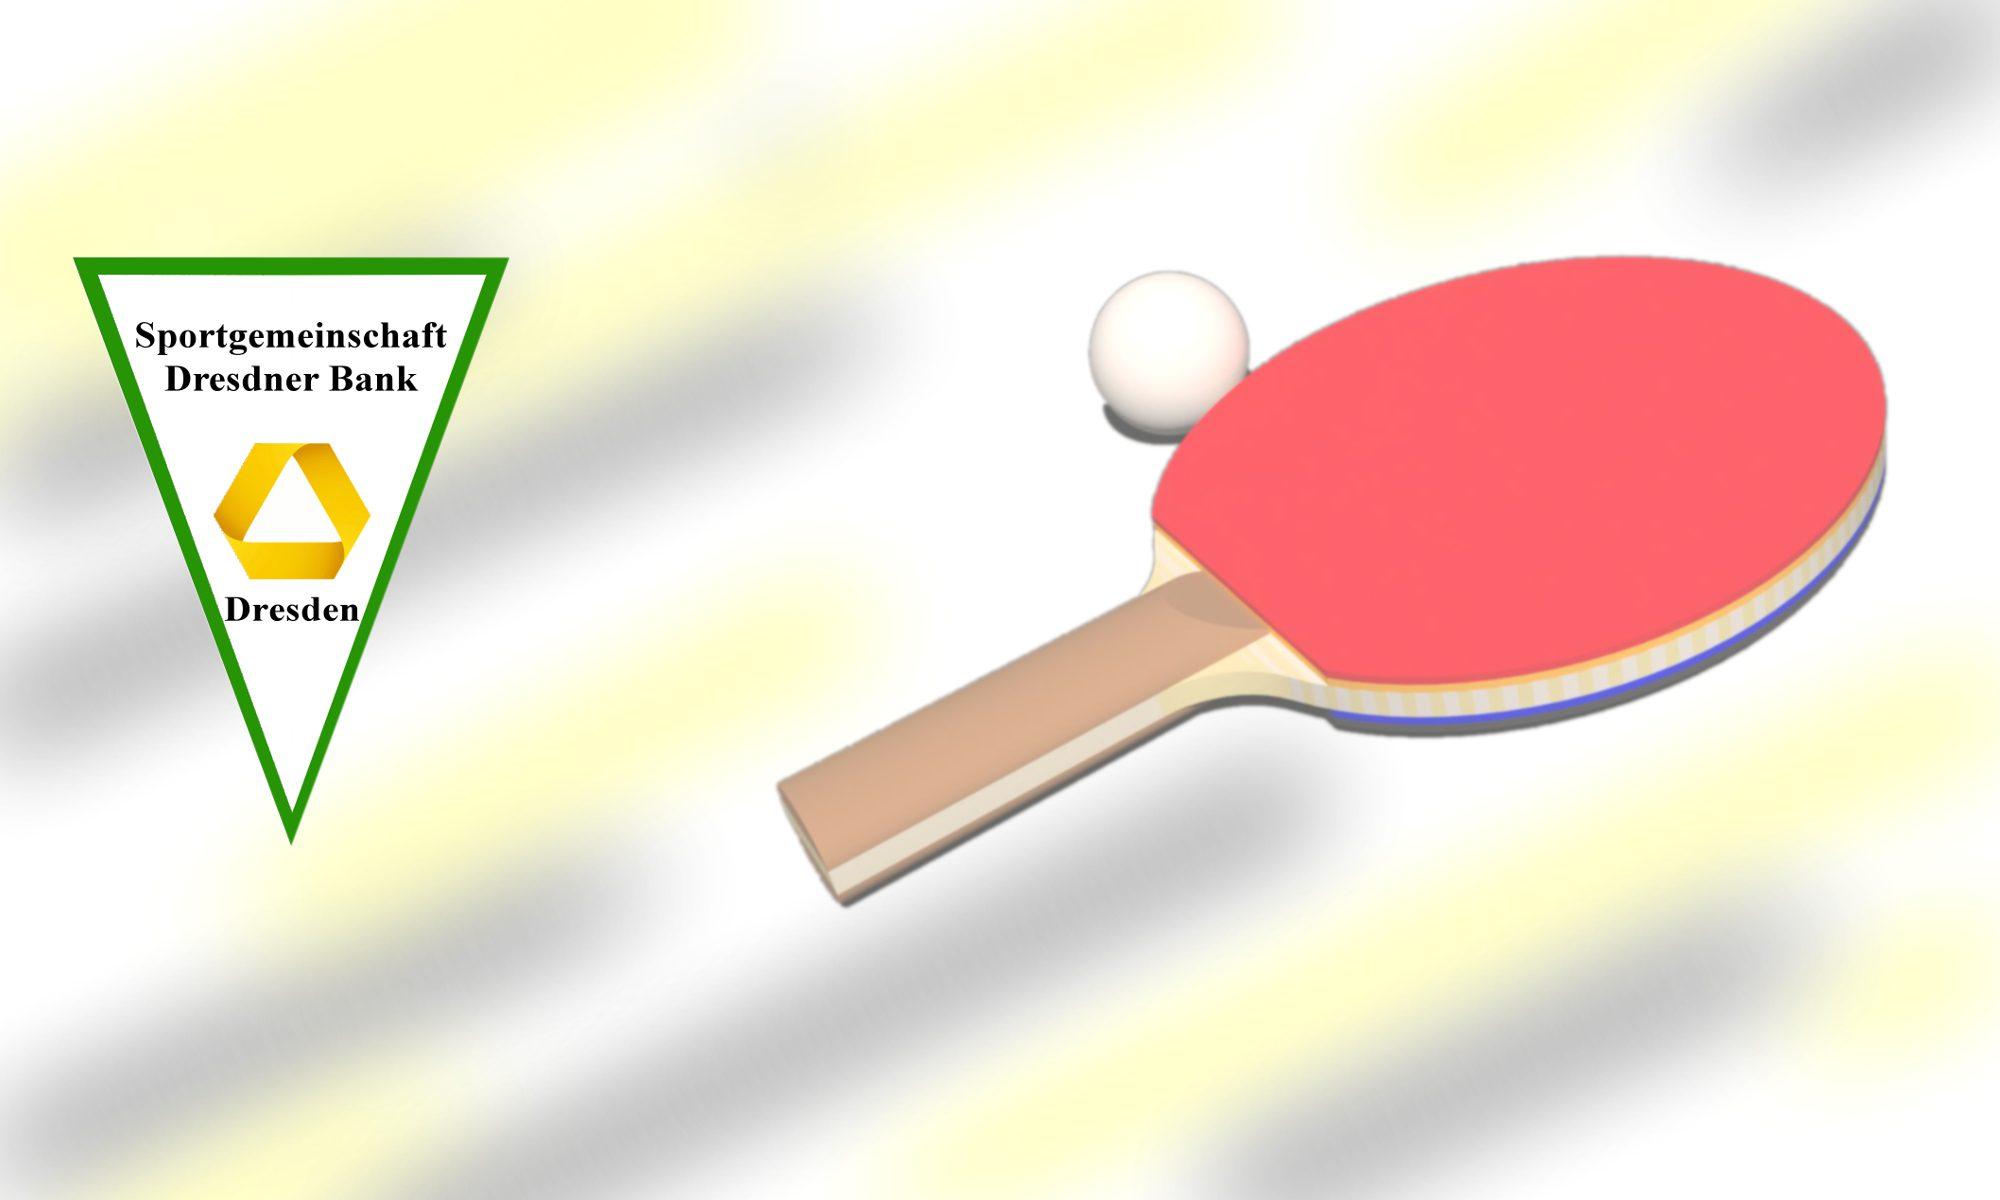 SG Dresdner Bank | Tischtennis